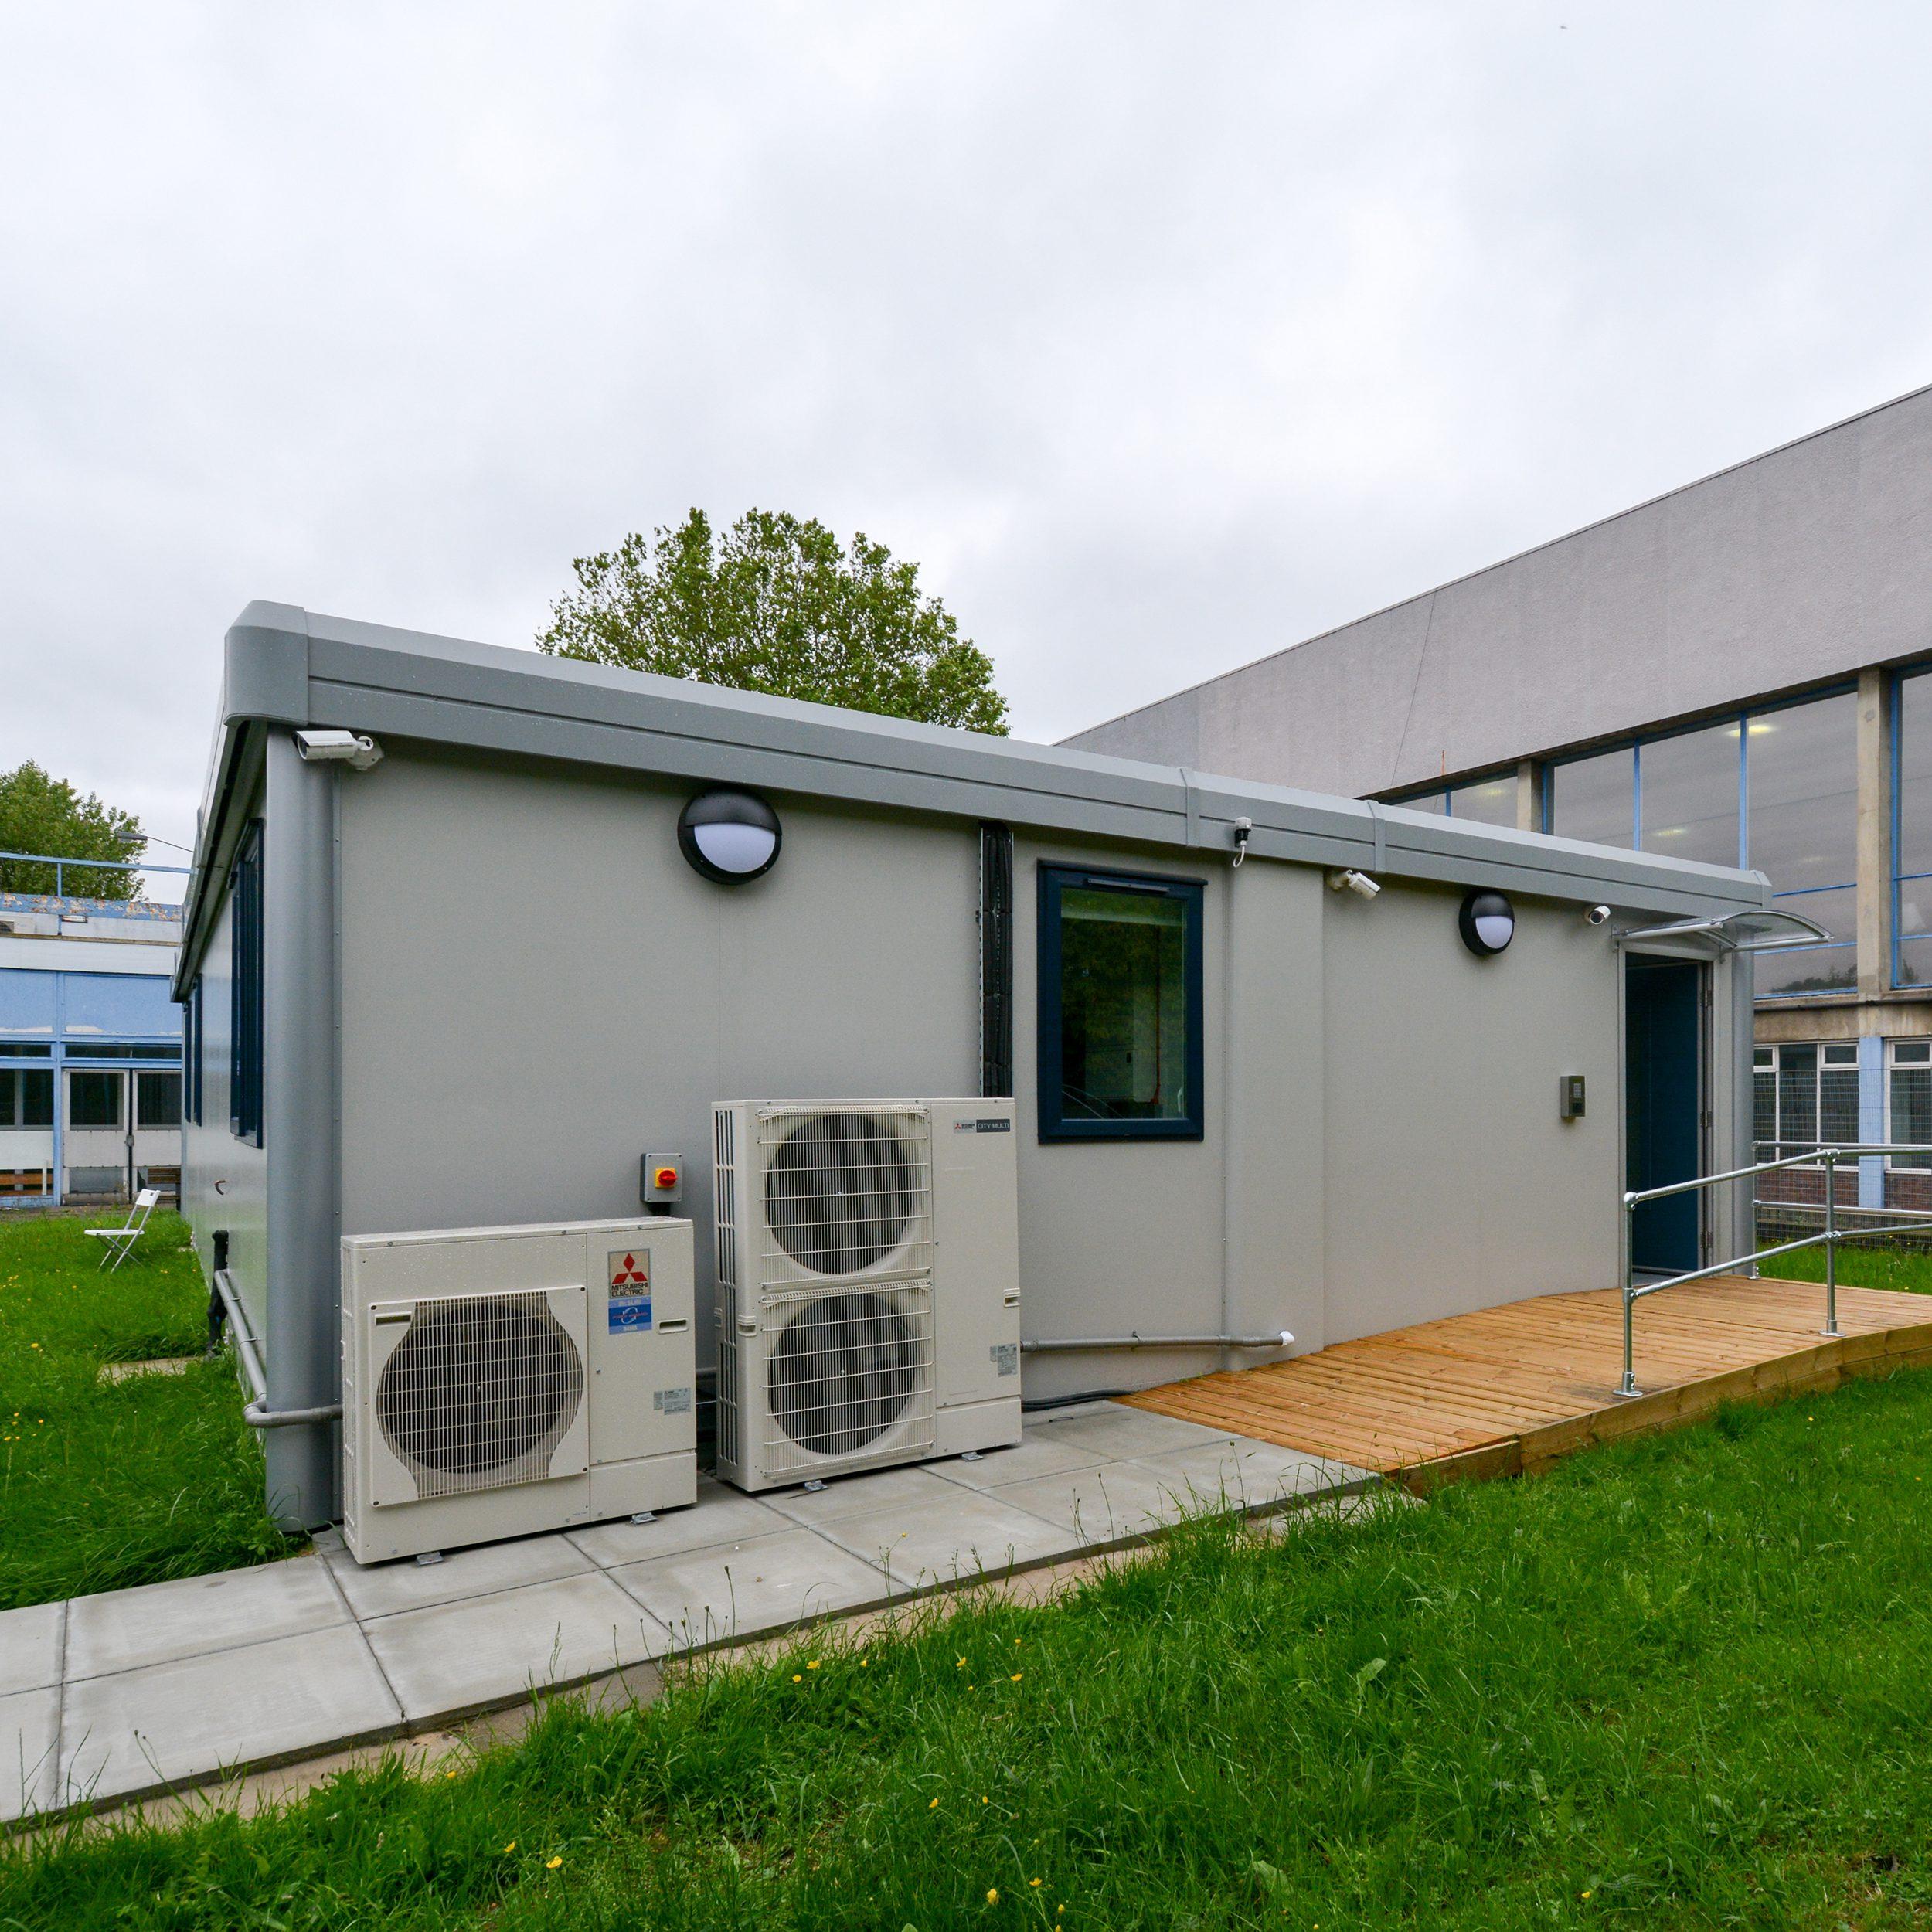 Modular police building